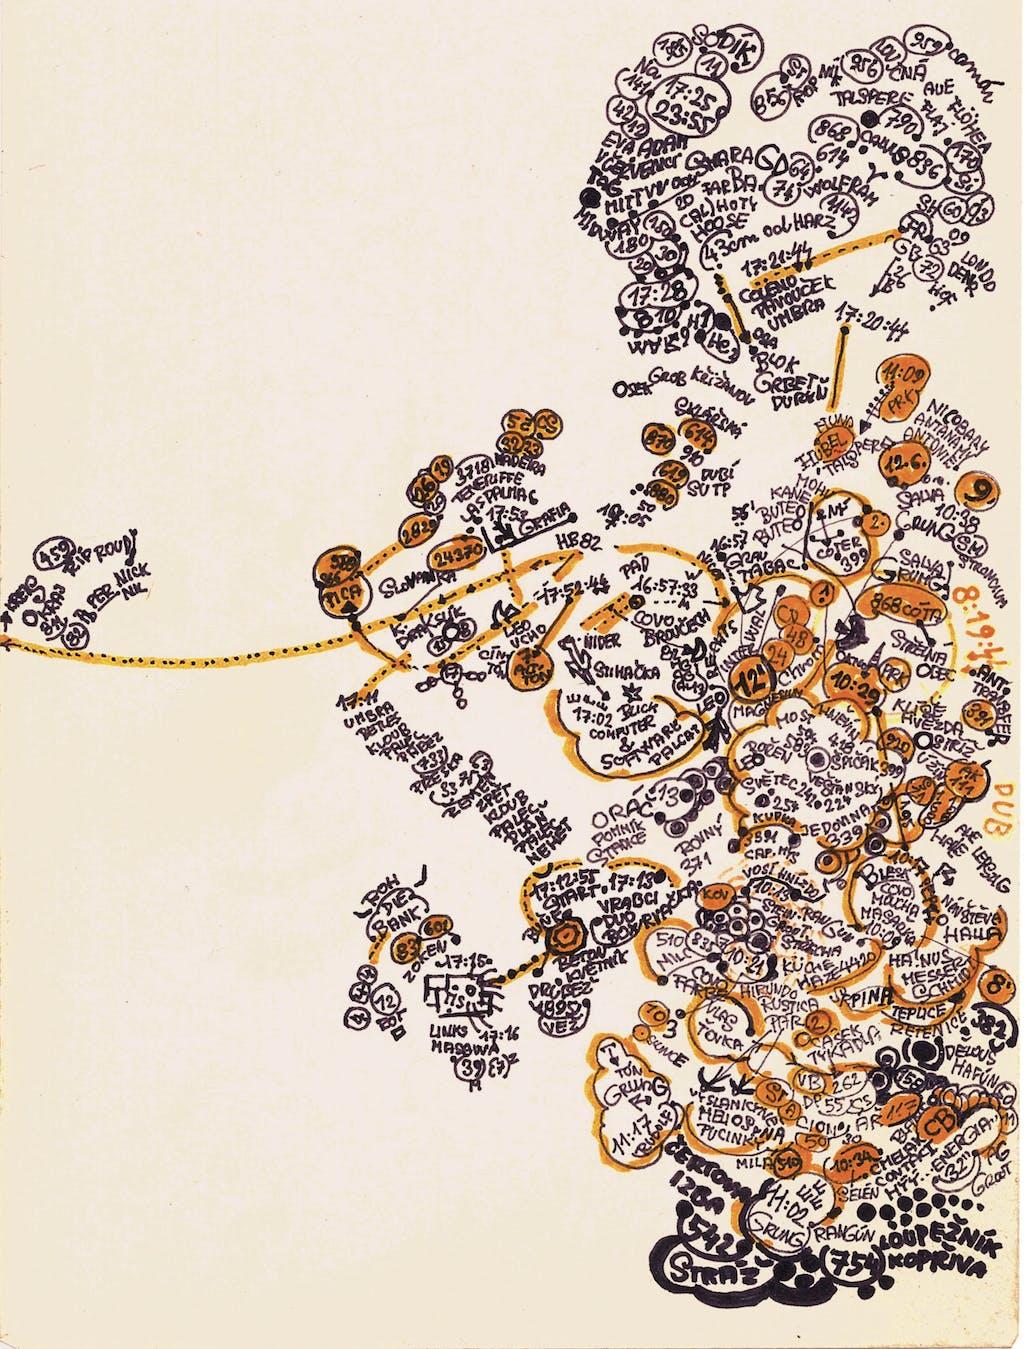 Zdenek Kosek, *untitled*, circa 1985. ink and marker on paper, 7.6 x 5.79 in - © christian berst — art brut